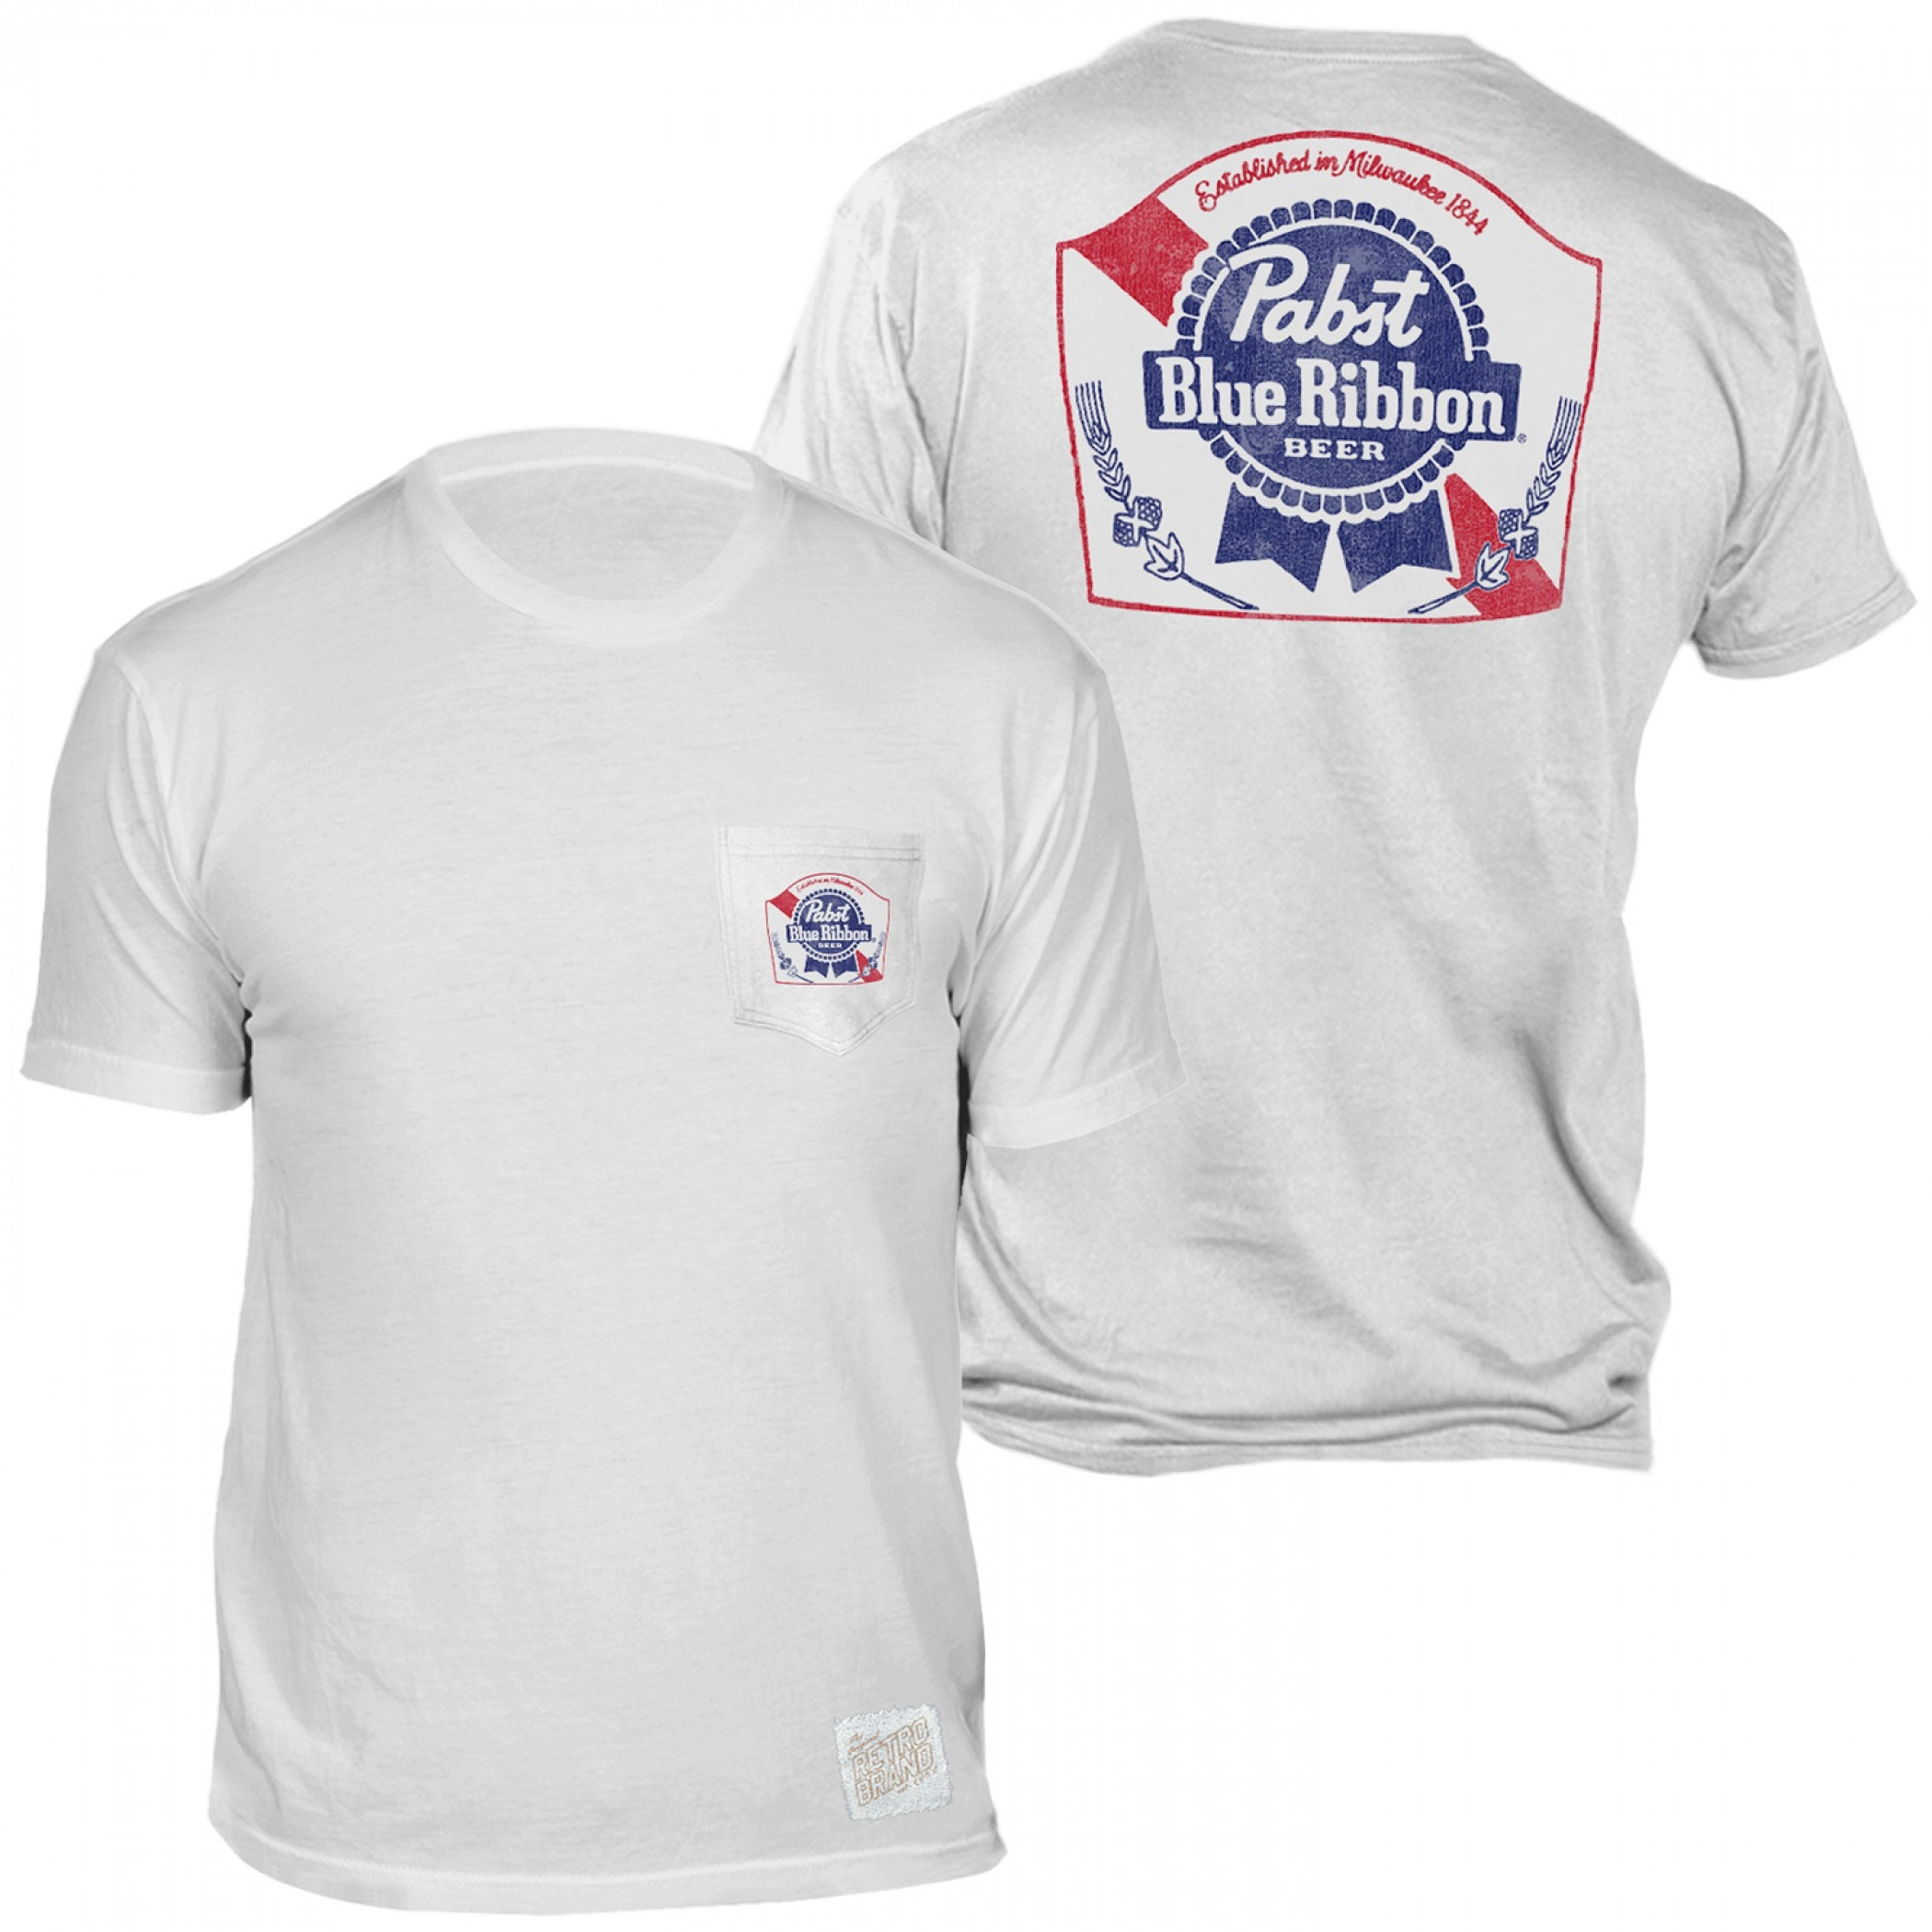 Pabst Blue Ribbon Beer Front and Back Print Pocket T-Shirt